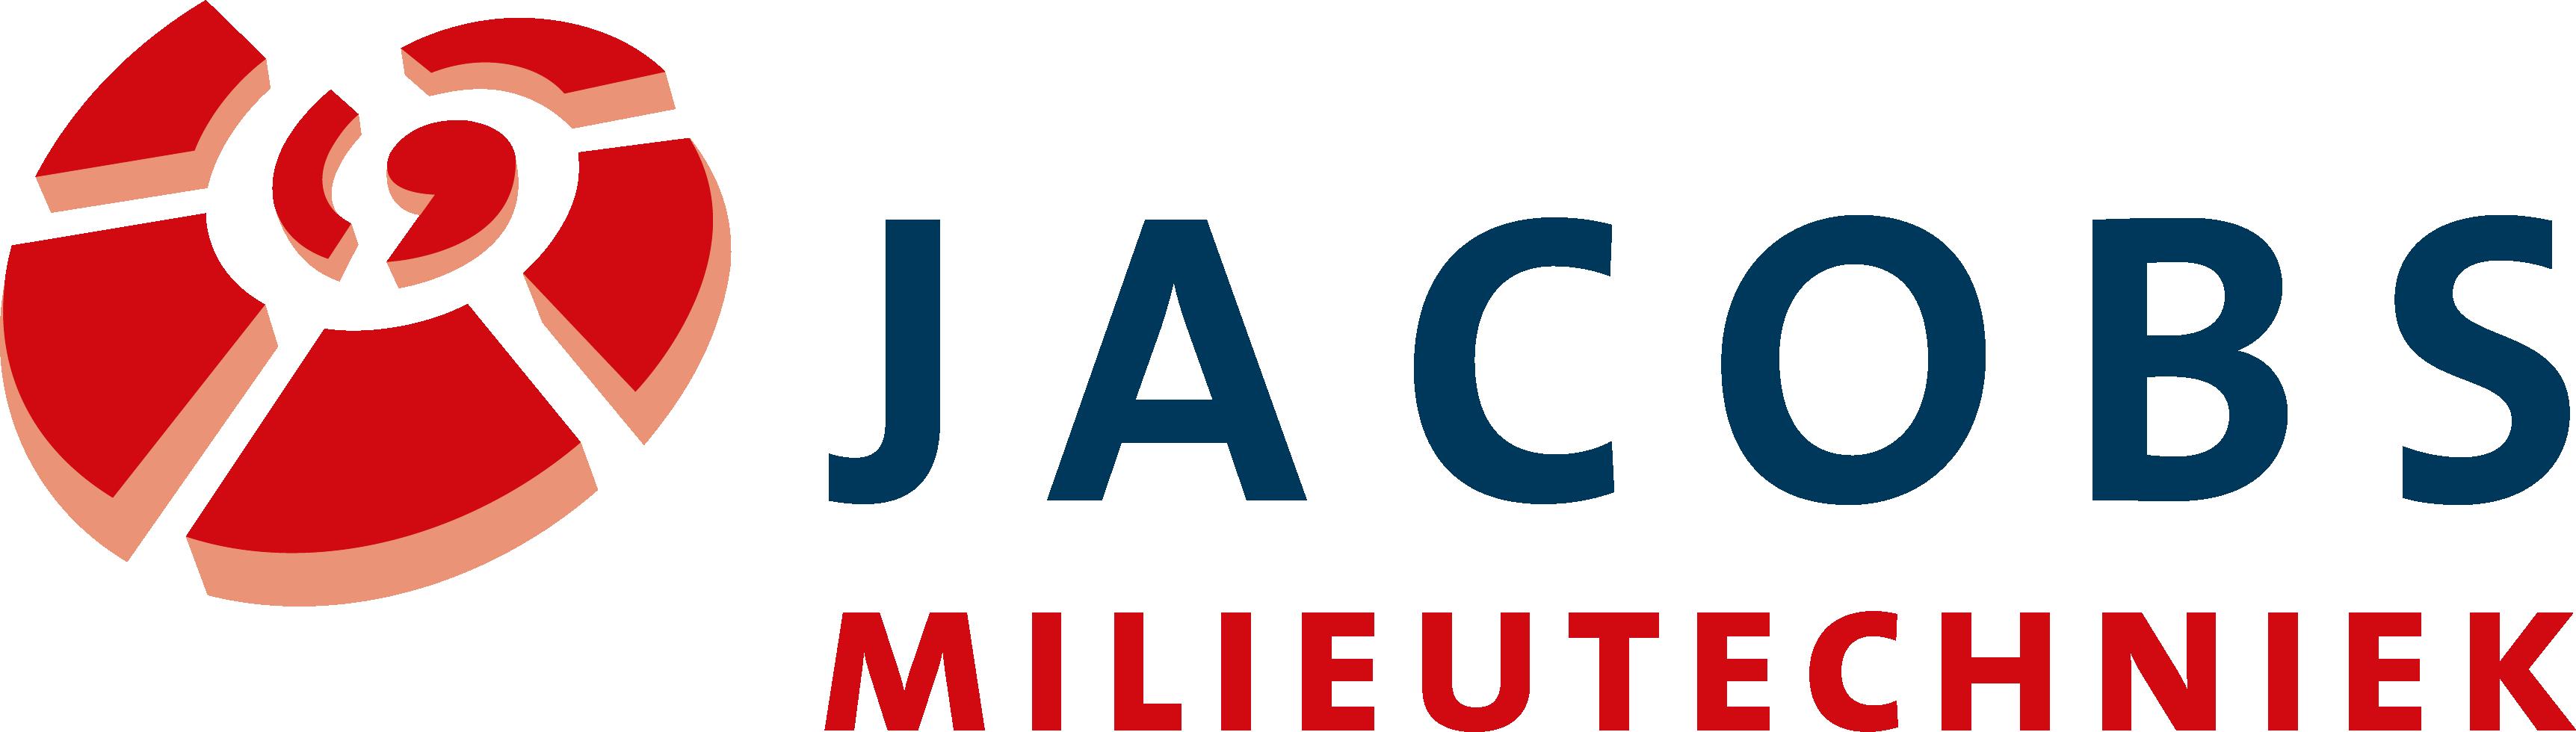 Jacobs Milieutechniek BV